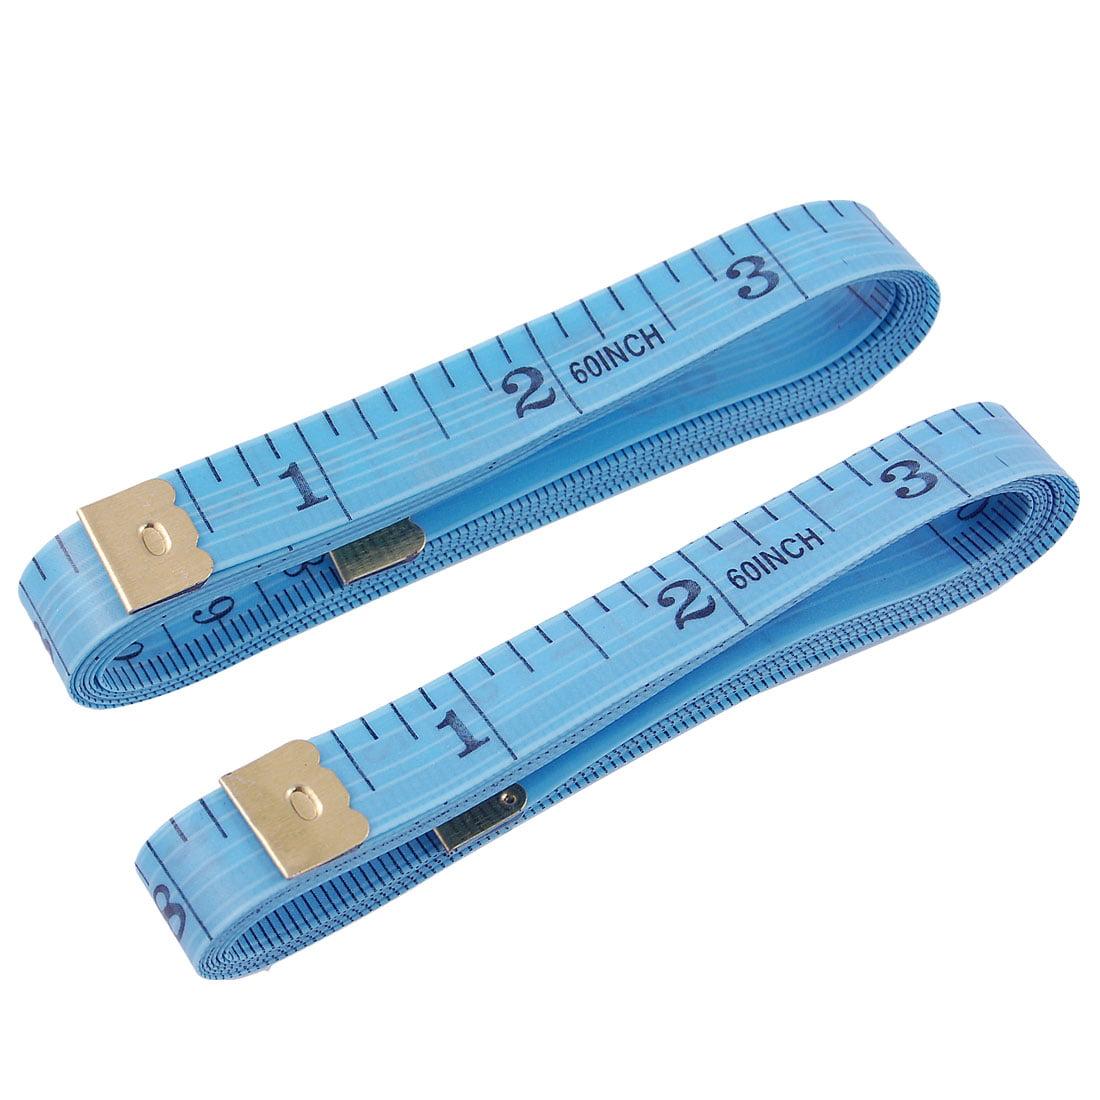 Unique Bargains 5-Foot Inch/Metric Soft Fiberglass Tape Measure Sewing Tailor Cloth Ruler 2 Pcs